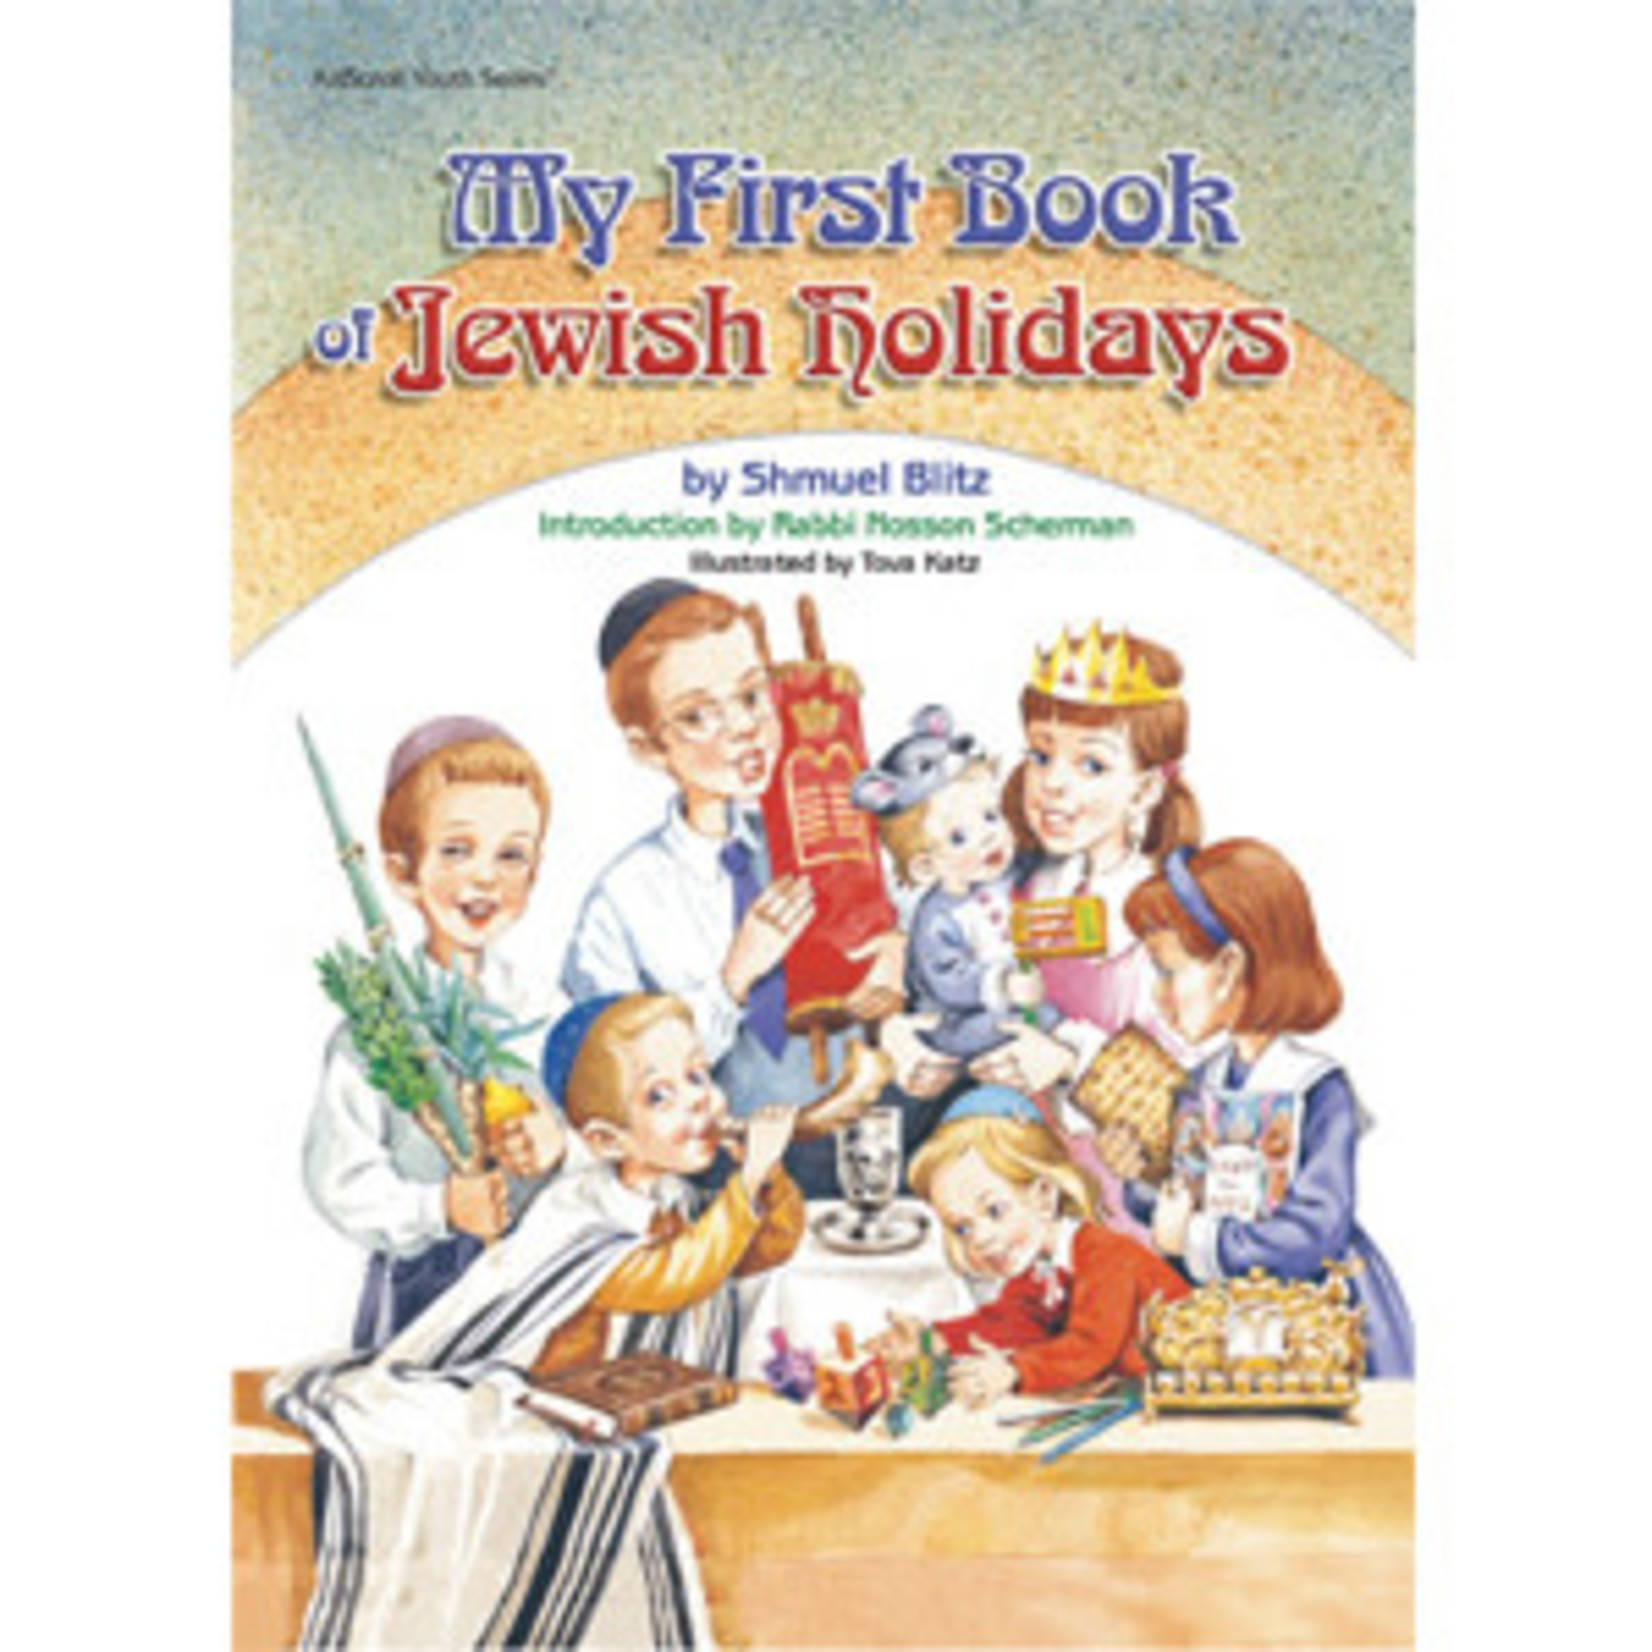 My First Book of Jewish Holidays